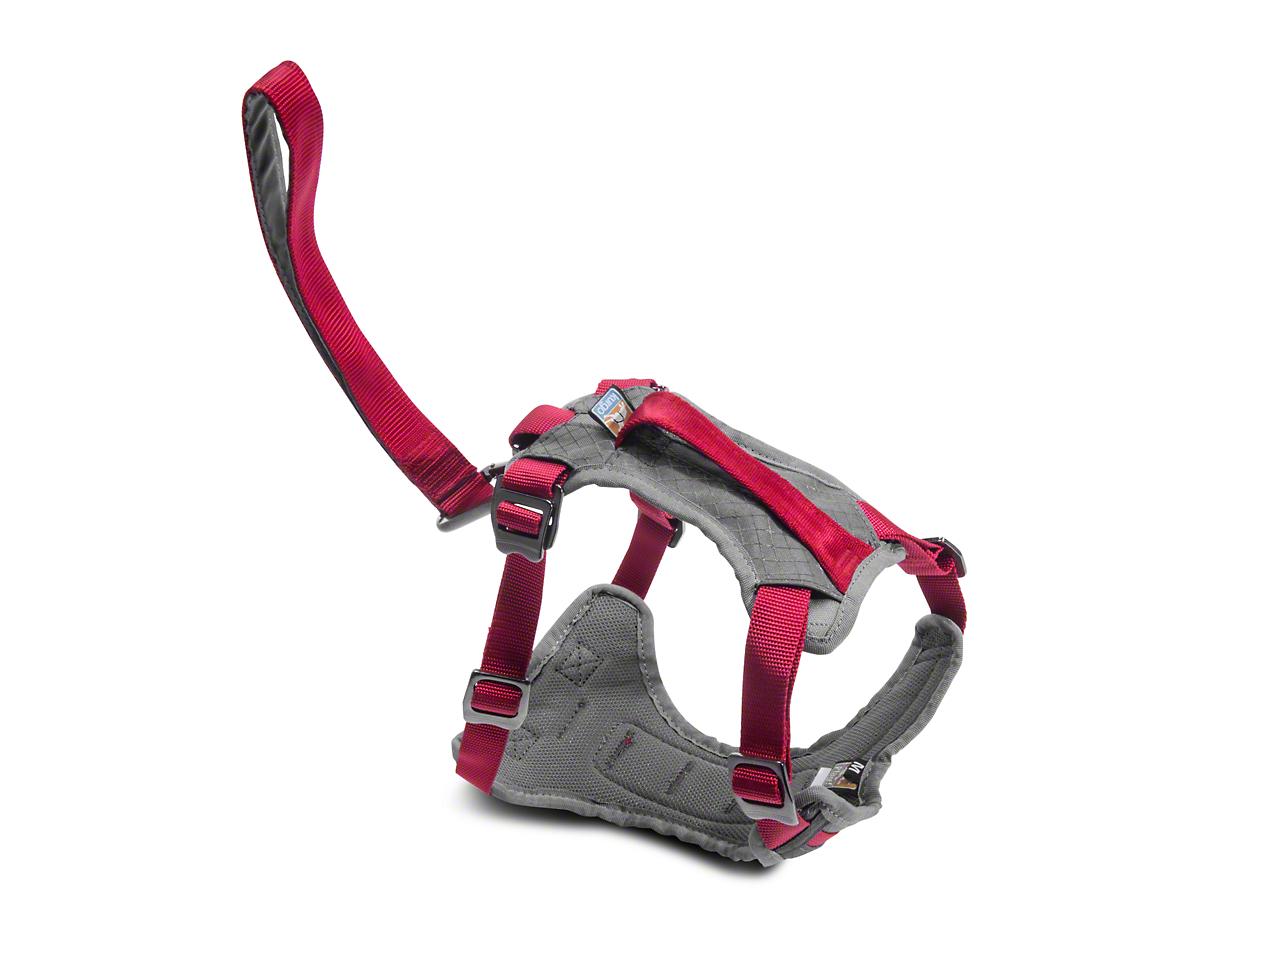 Kurgo Journey Dog Harness - Chili Red/Charcoal